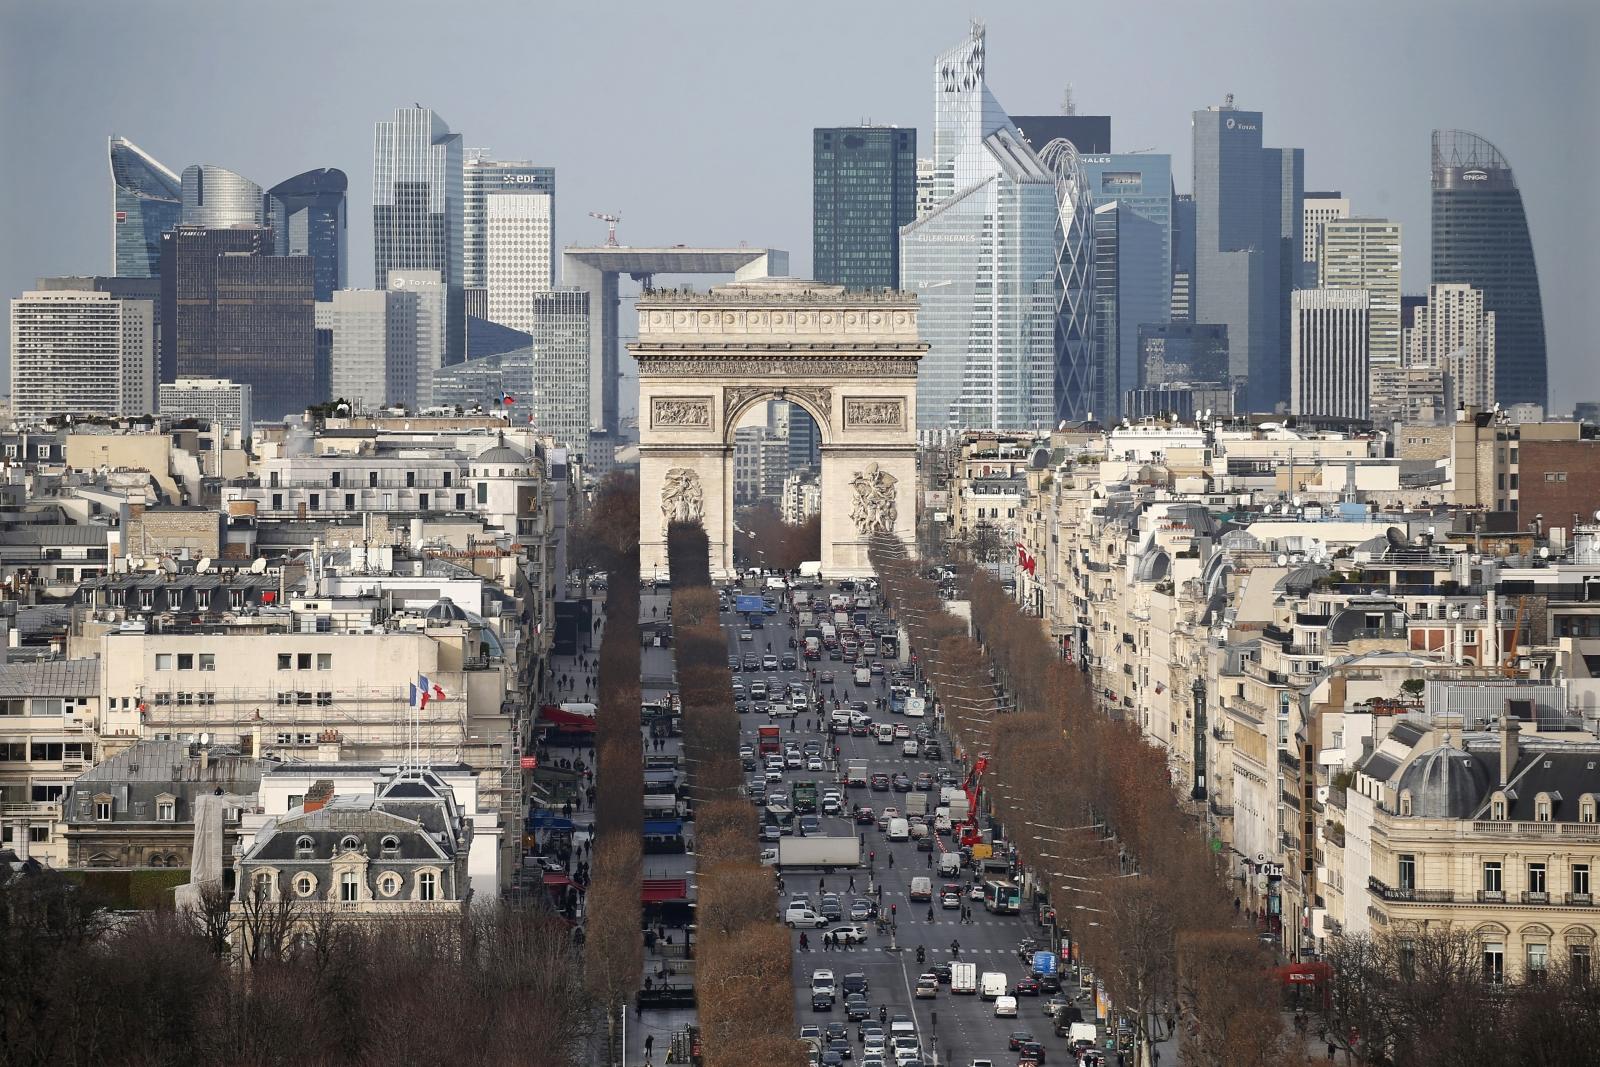 Champs Elysees Avenue